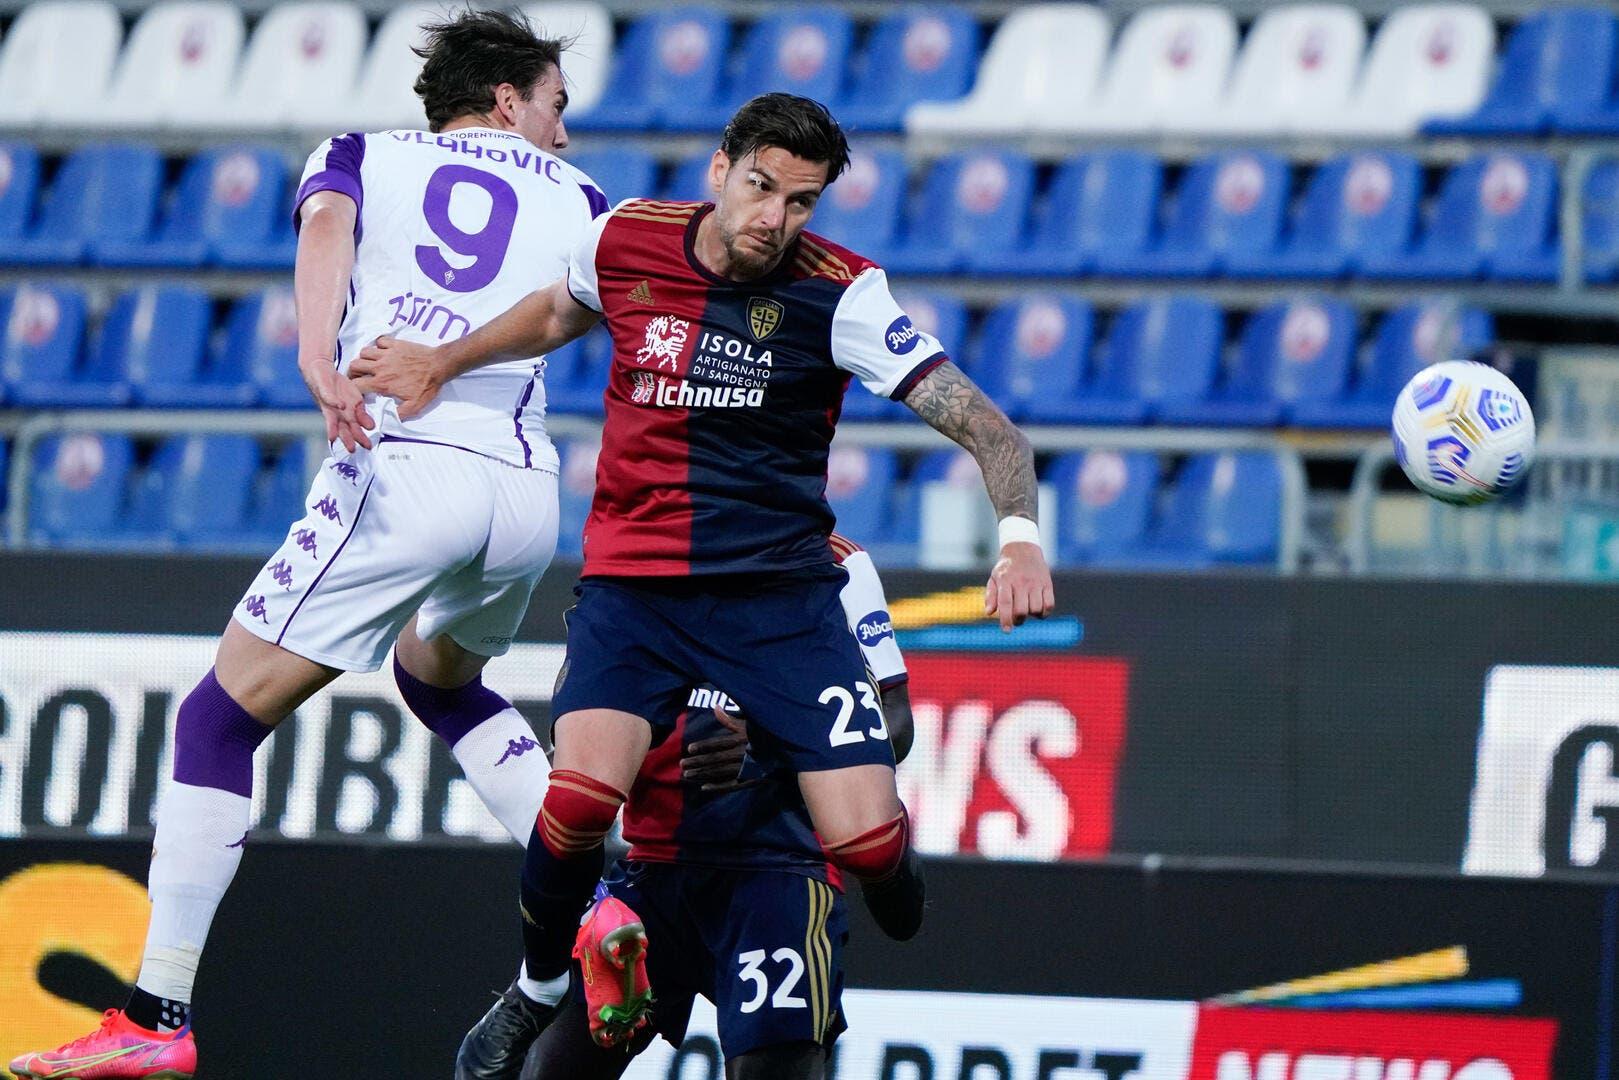 OM : Simeone à Marseille, Longoria sort l'offre fatale !